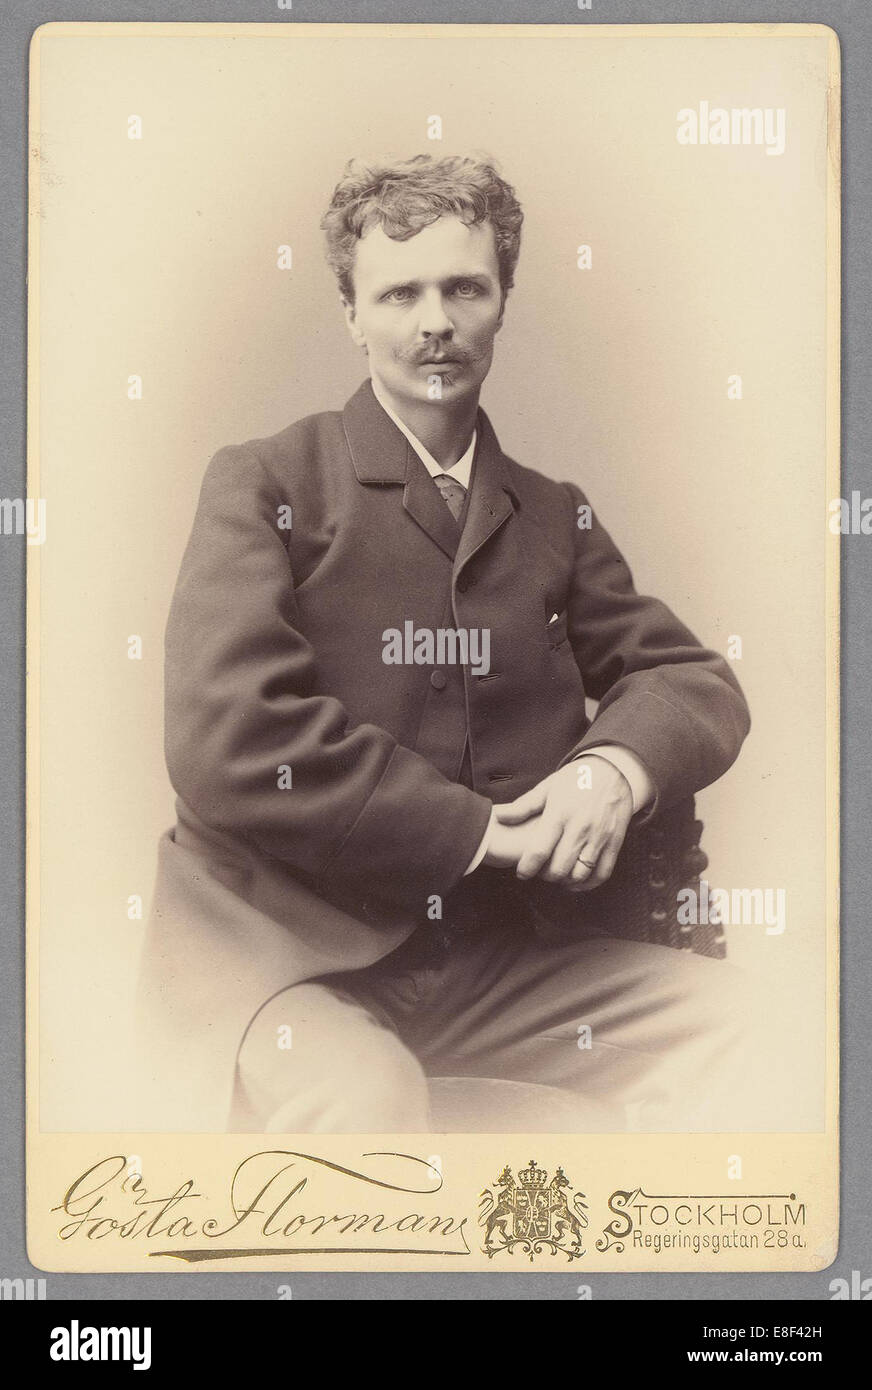 August Strindberg Artist: Florman, Gösta (1831-1900) - Stock Image